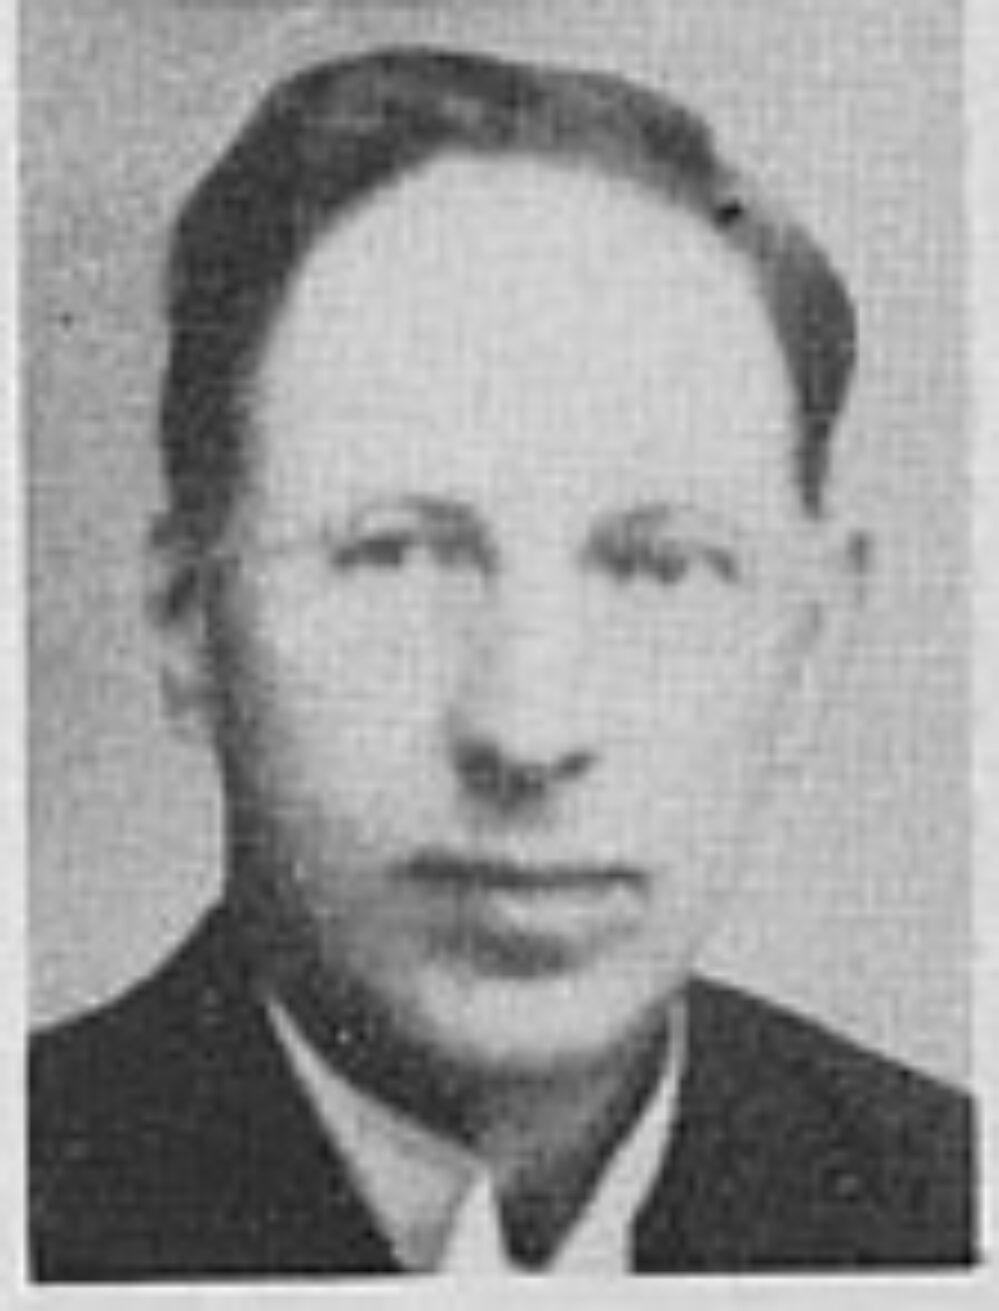 Olaf Albert Olsen Moy